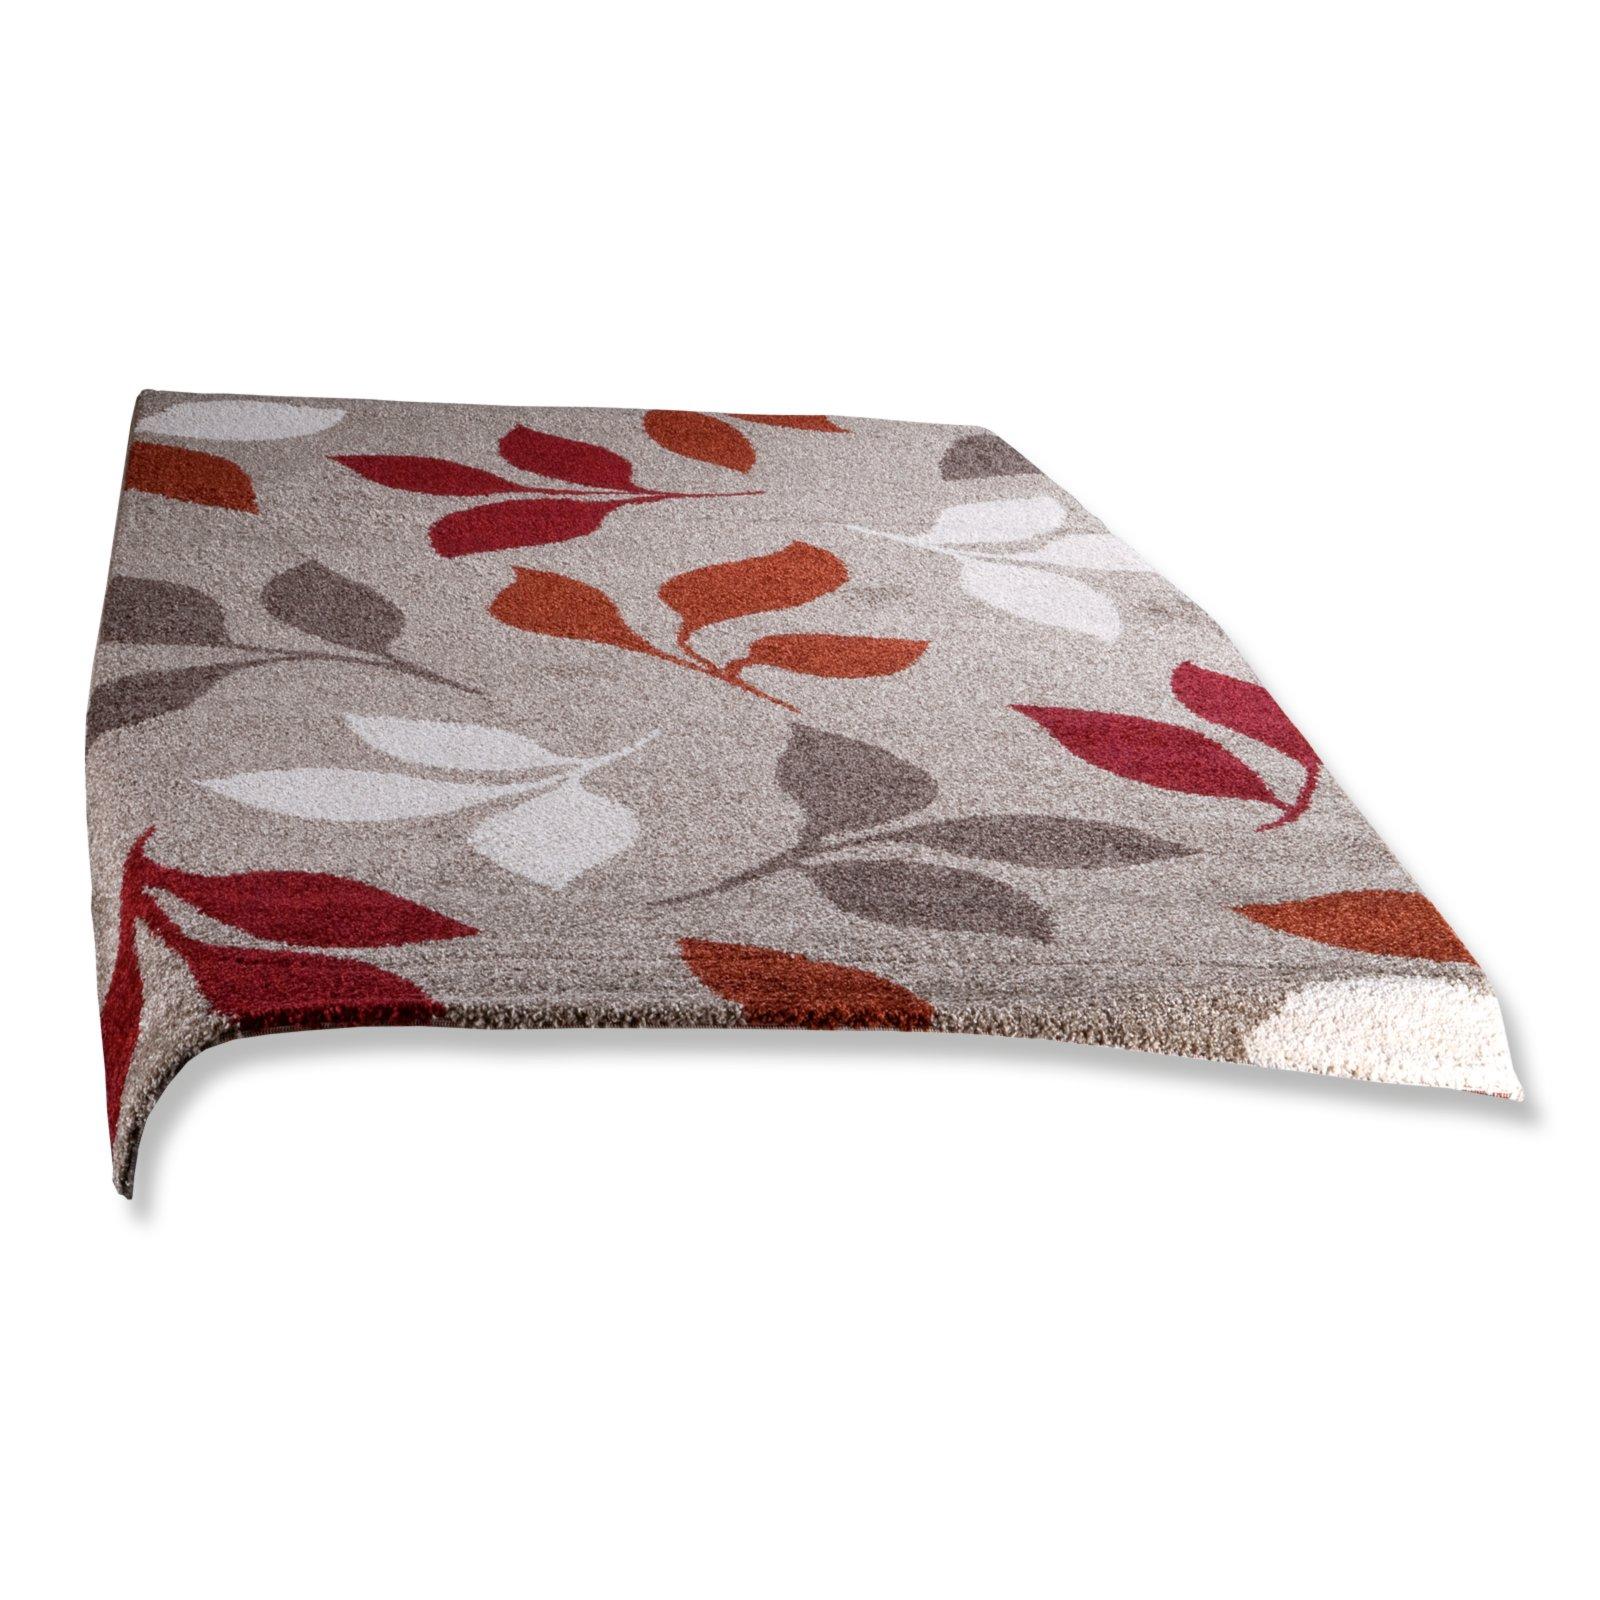 frisee teppich casa beige rot 160x230 cm gemusterte teppiche teppiche l ufer deko. Black Bedroom Furniture Sets. Home Design Ideas